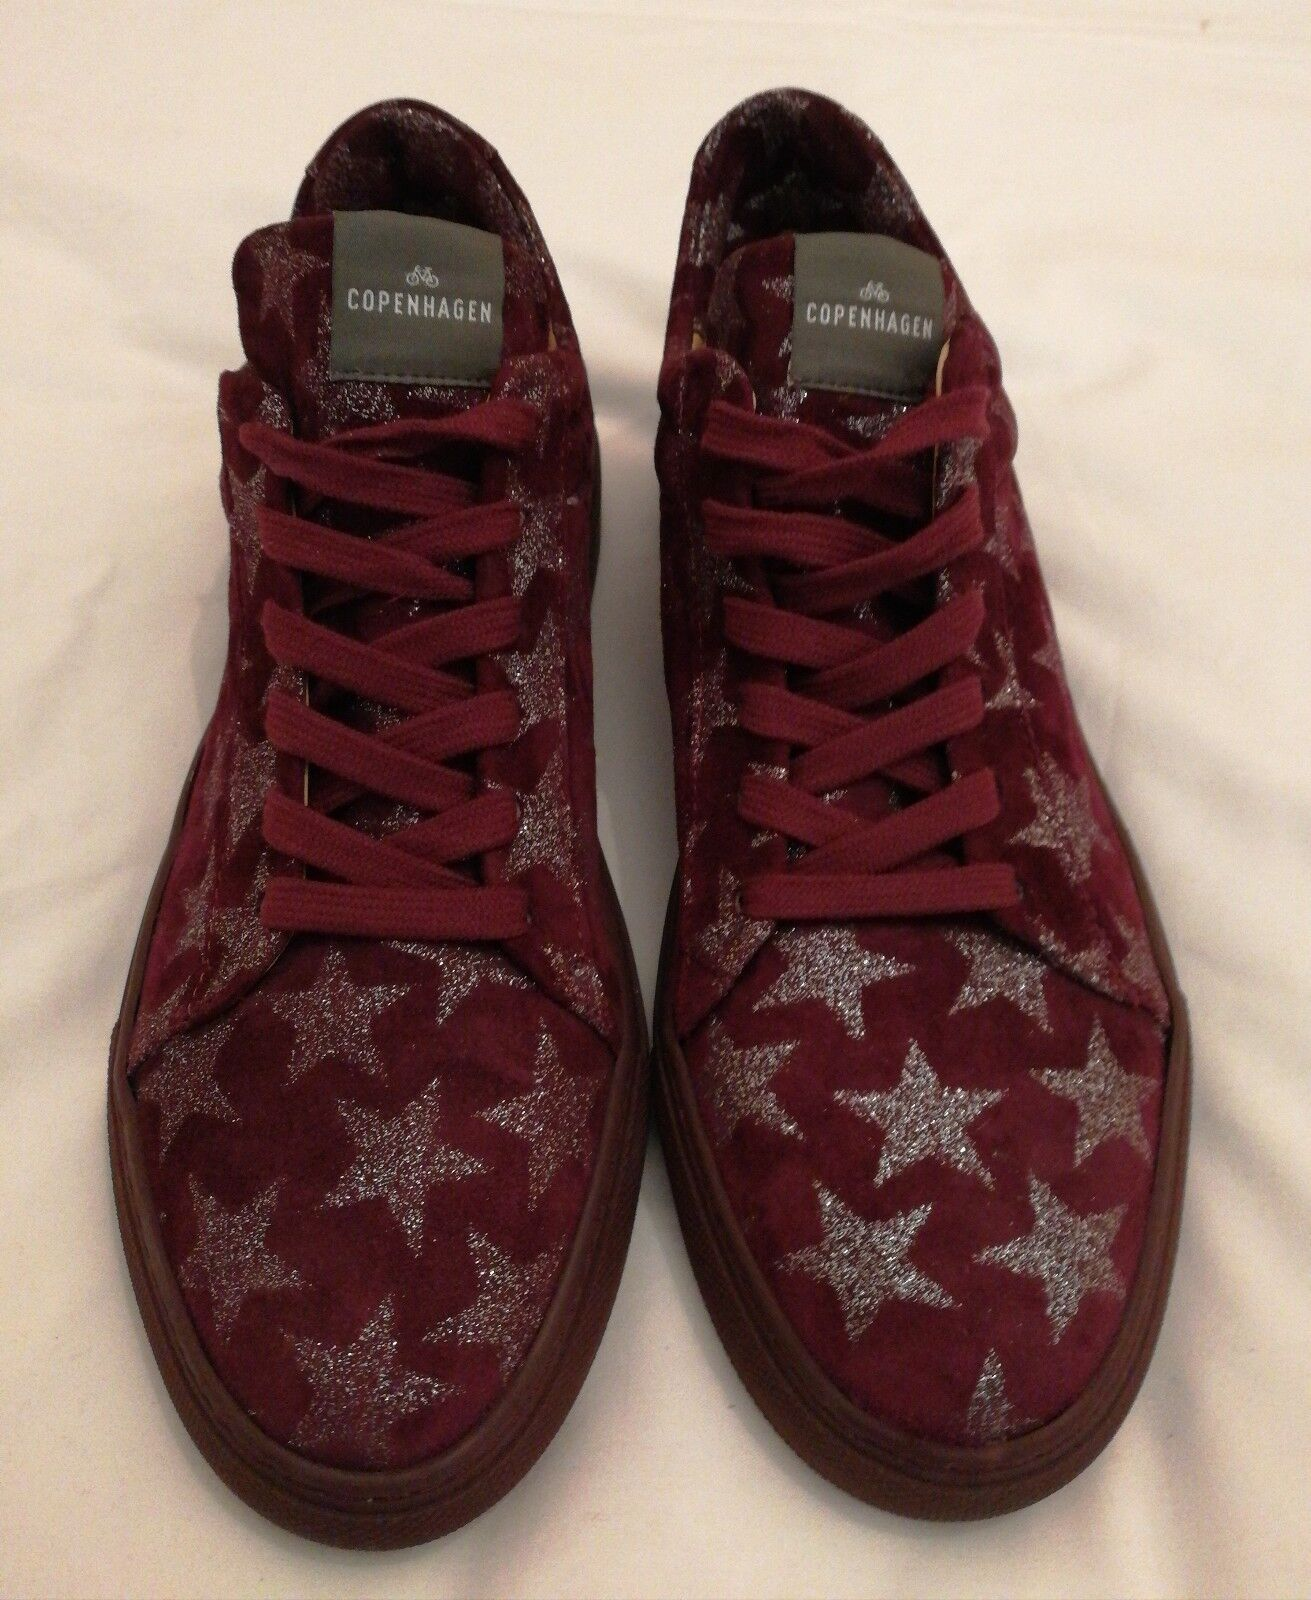 Copenhagen Suede Größe Star Lace-up Sneakers Burgundy Größe Suede uk 6 eu 39 a295cb